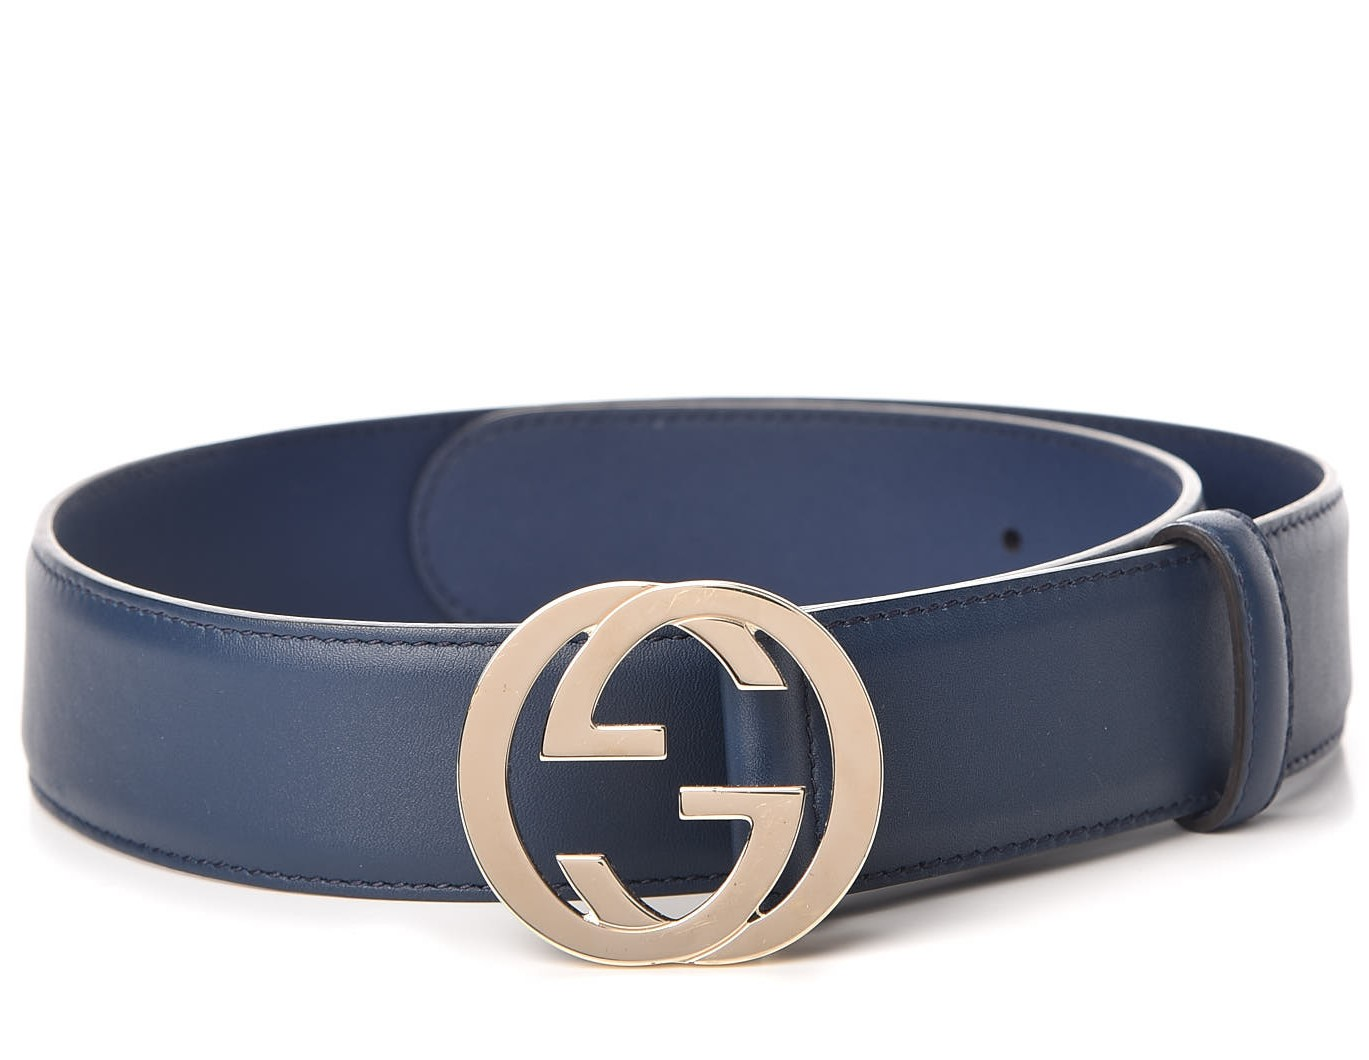 Gucci Blue Leather belt with interlocking G